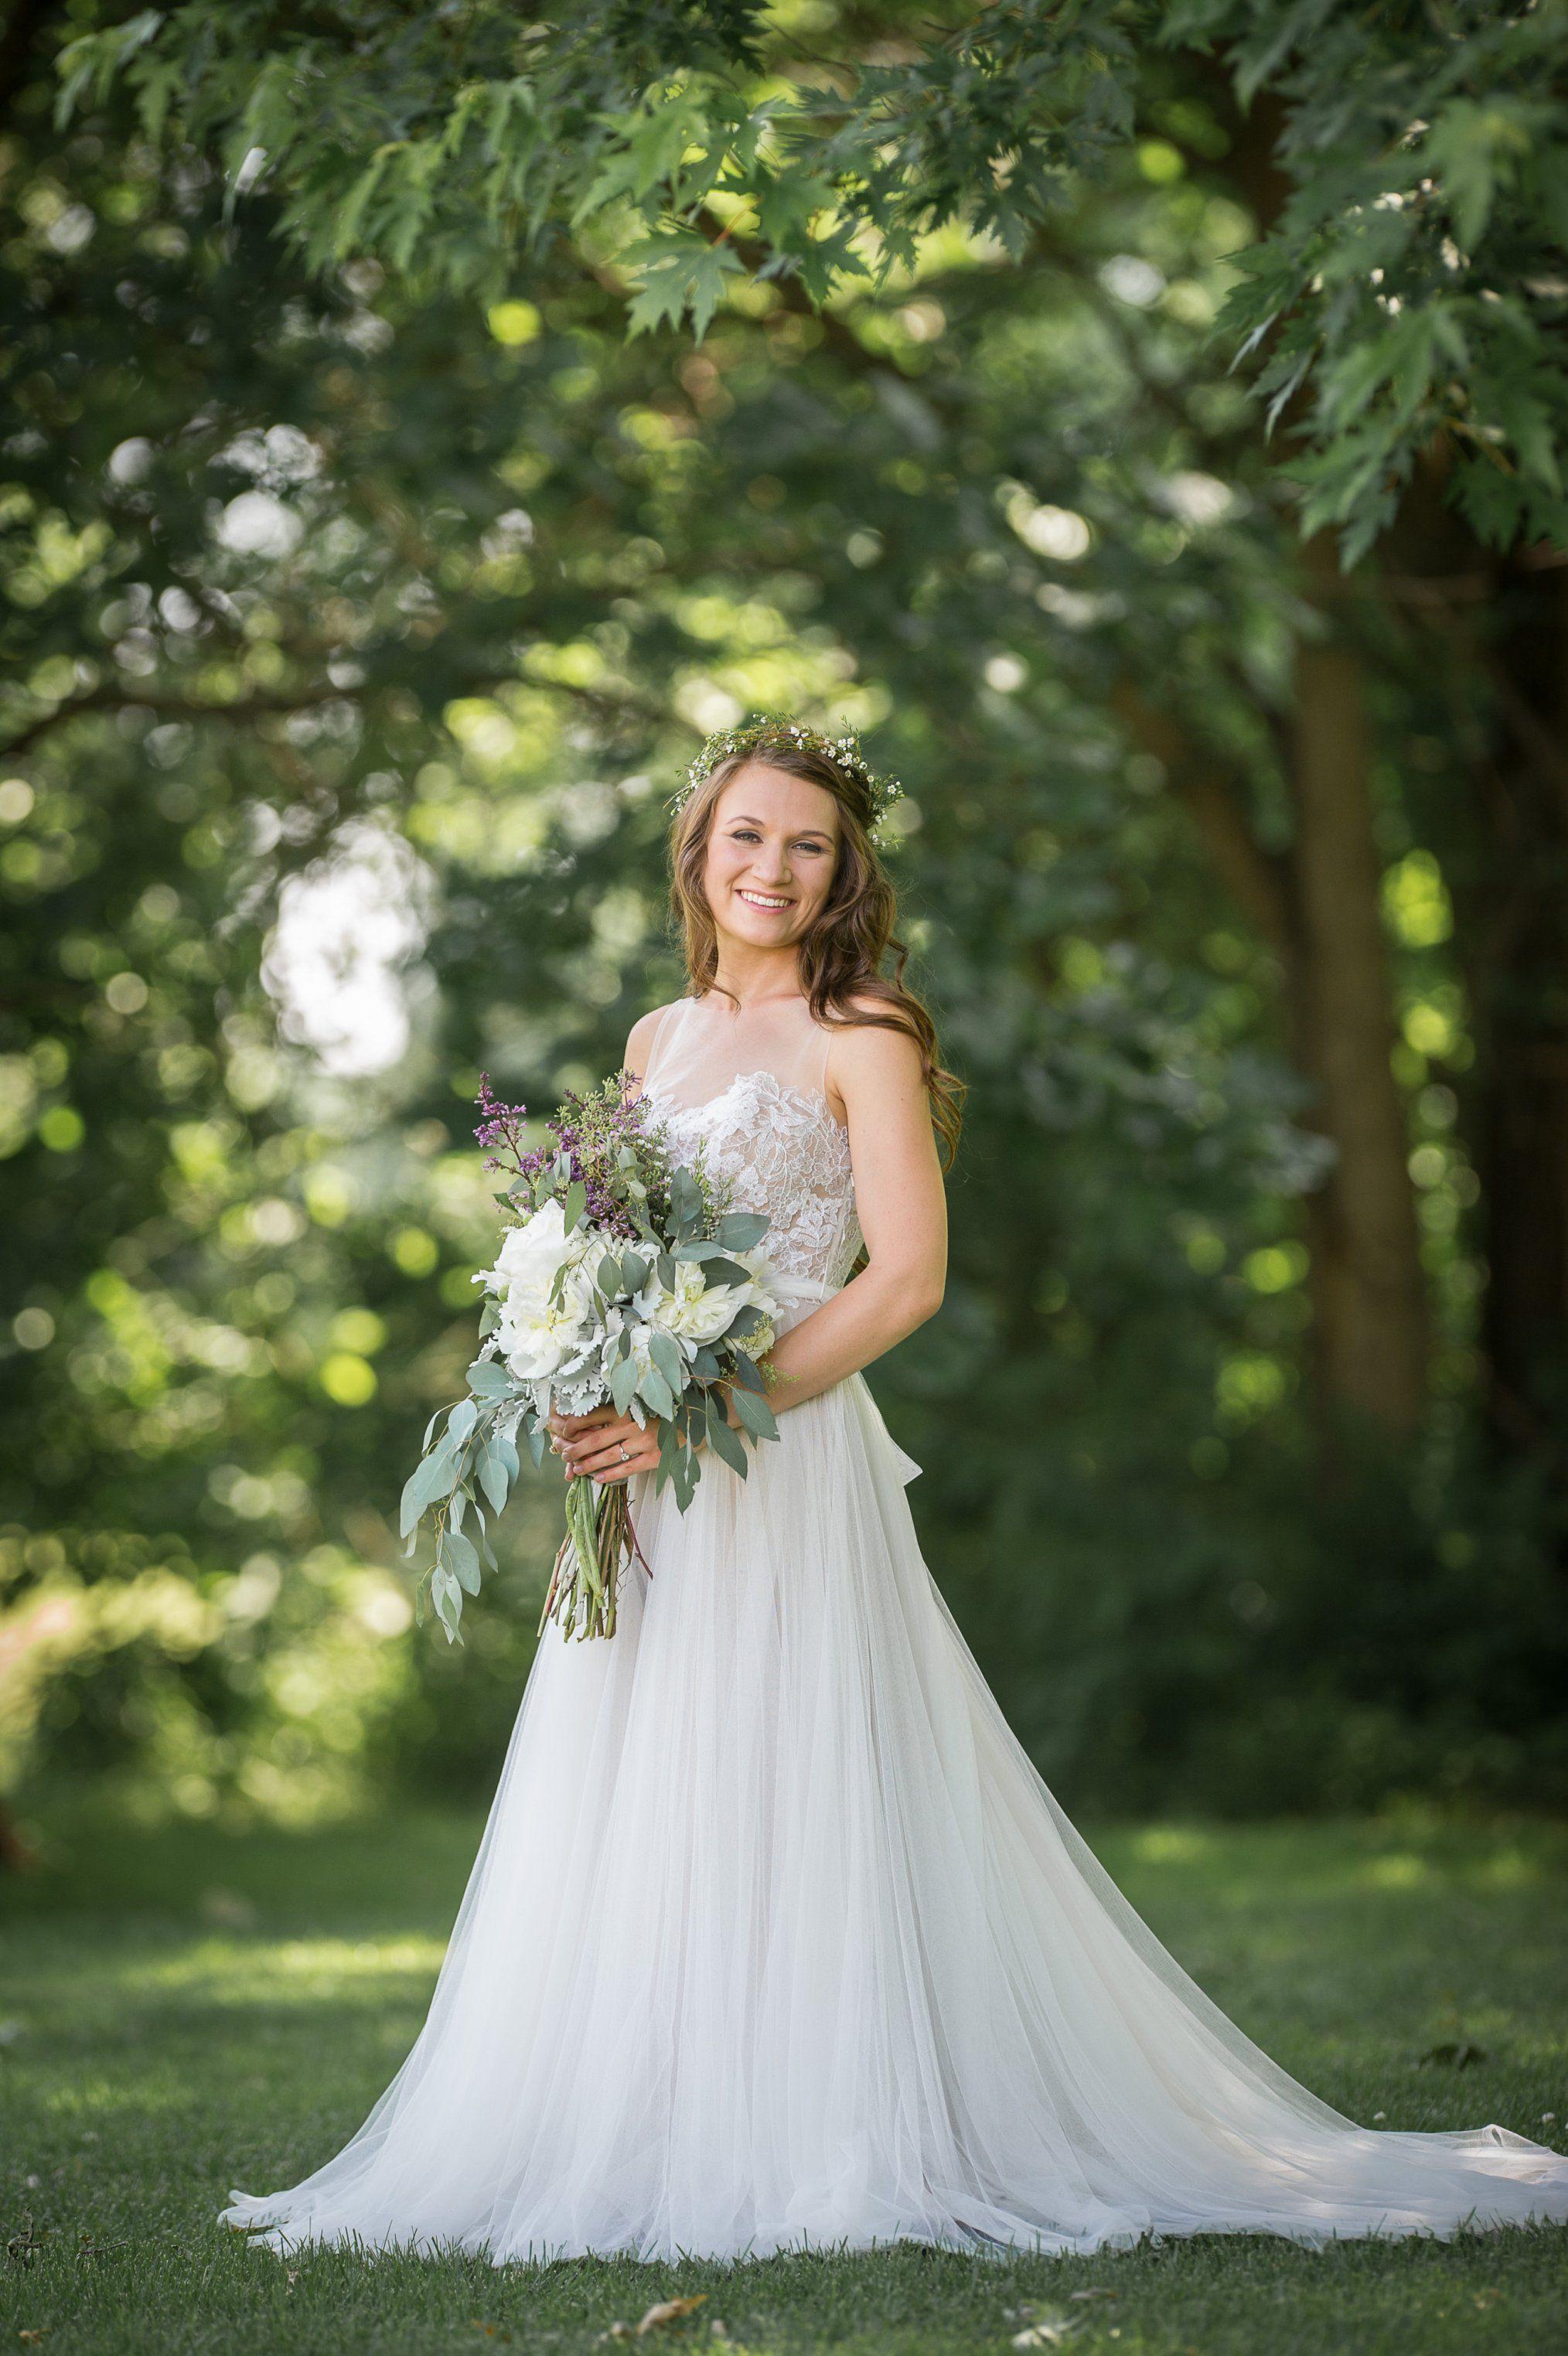 A Homegrown Minnesota Wedding: BHLDN Penelope Gown